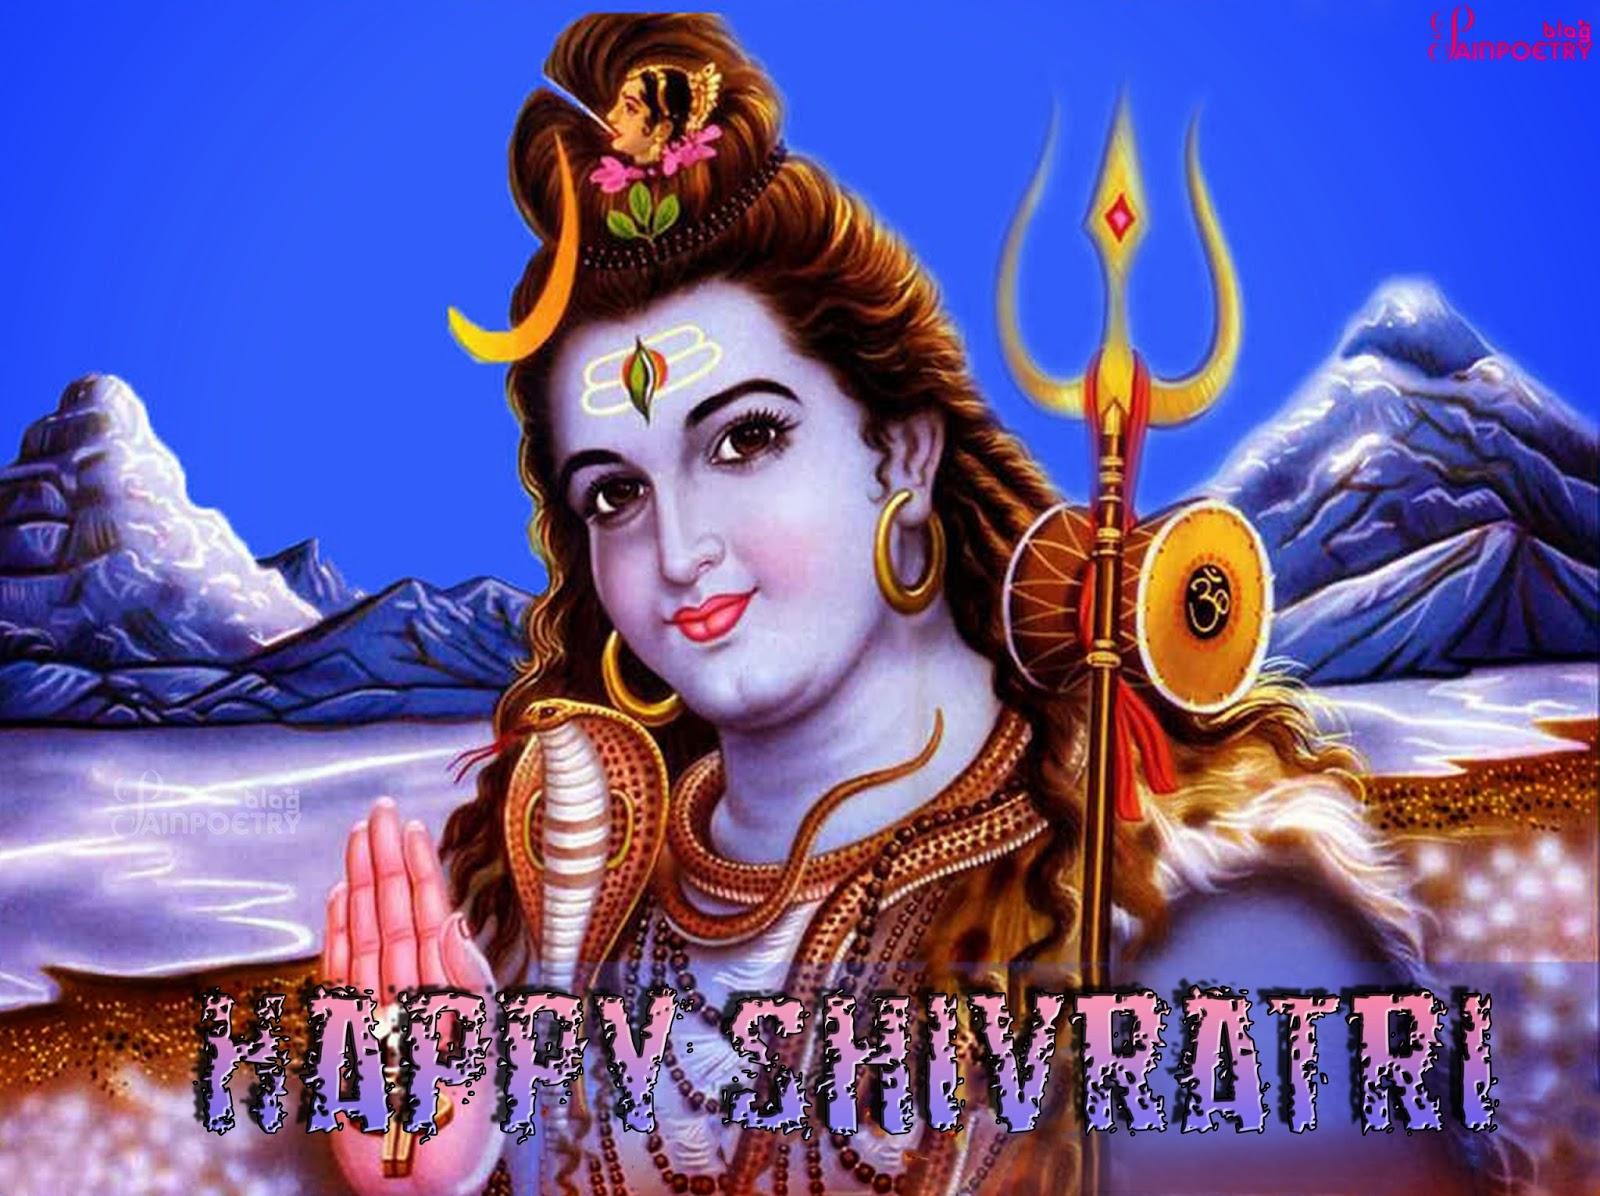 Happy-Shivratri-Wishes-Wallpaper-Image-Photo-Wallpaper-HD